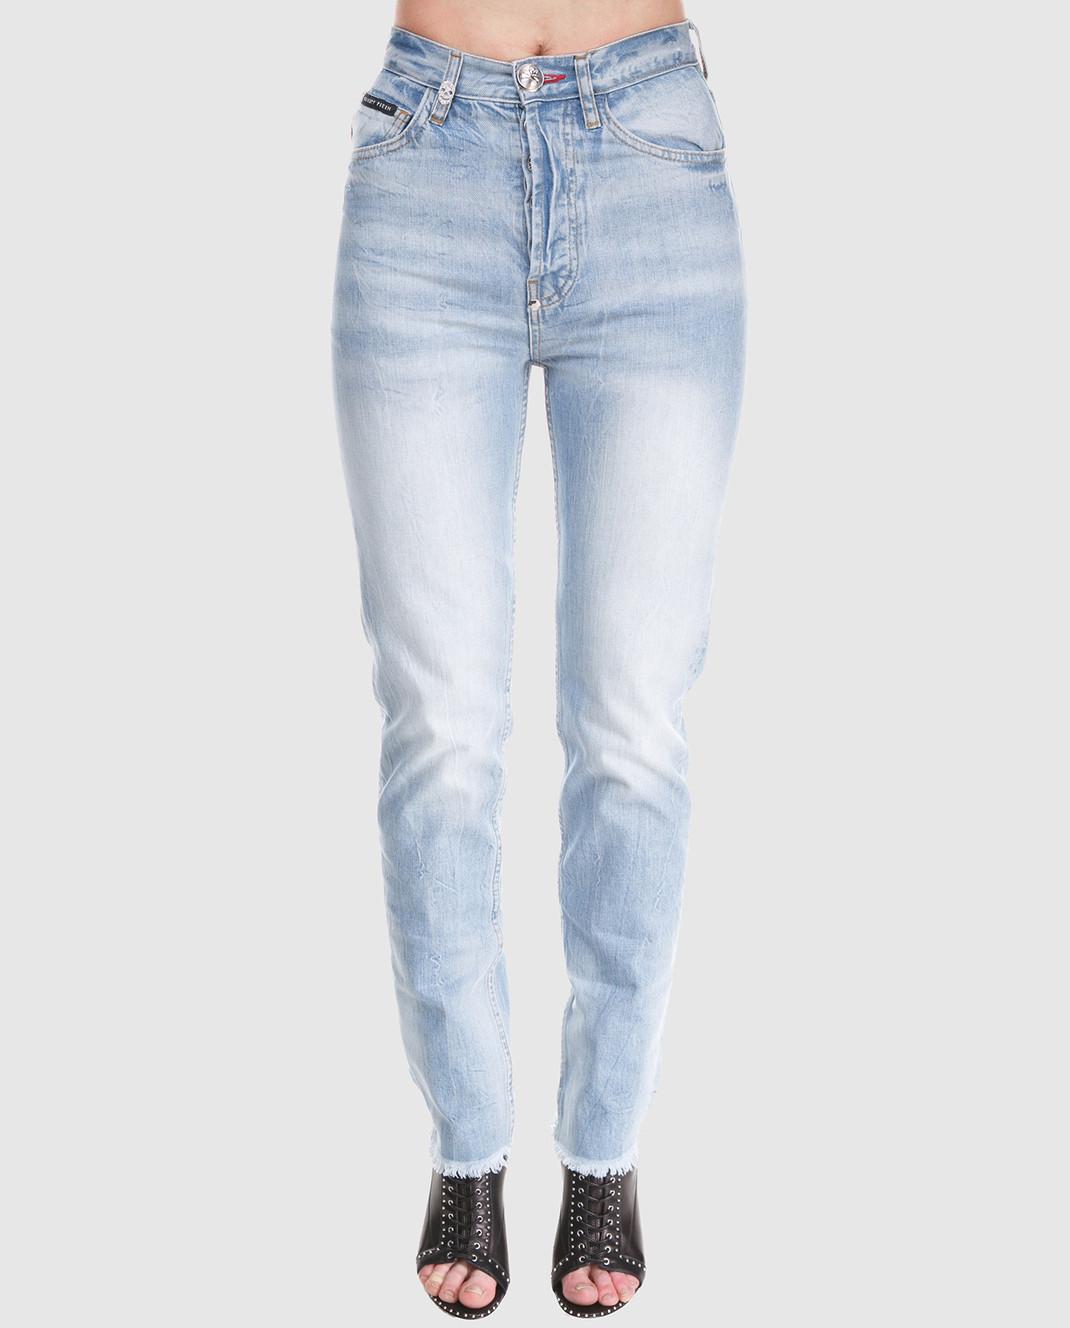 Philipp Plein Голубые джинсы изображение 3